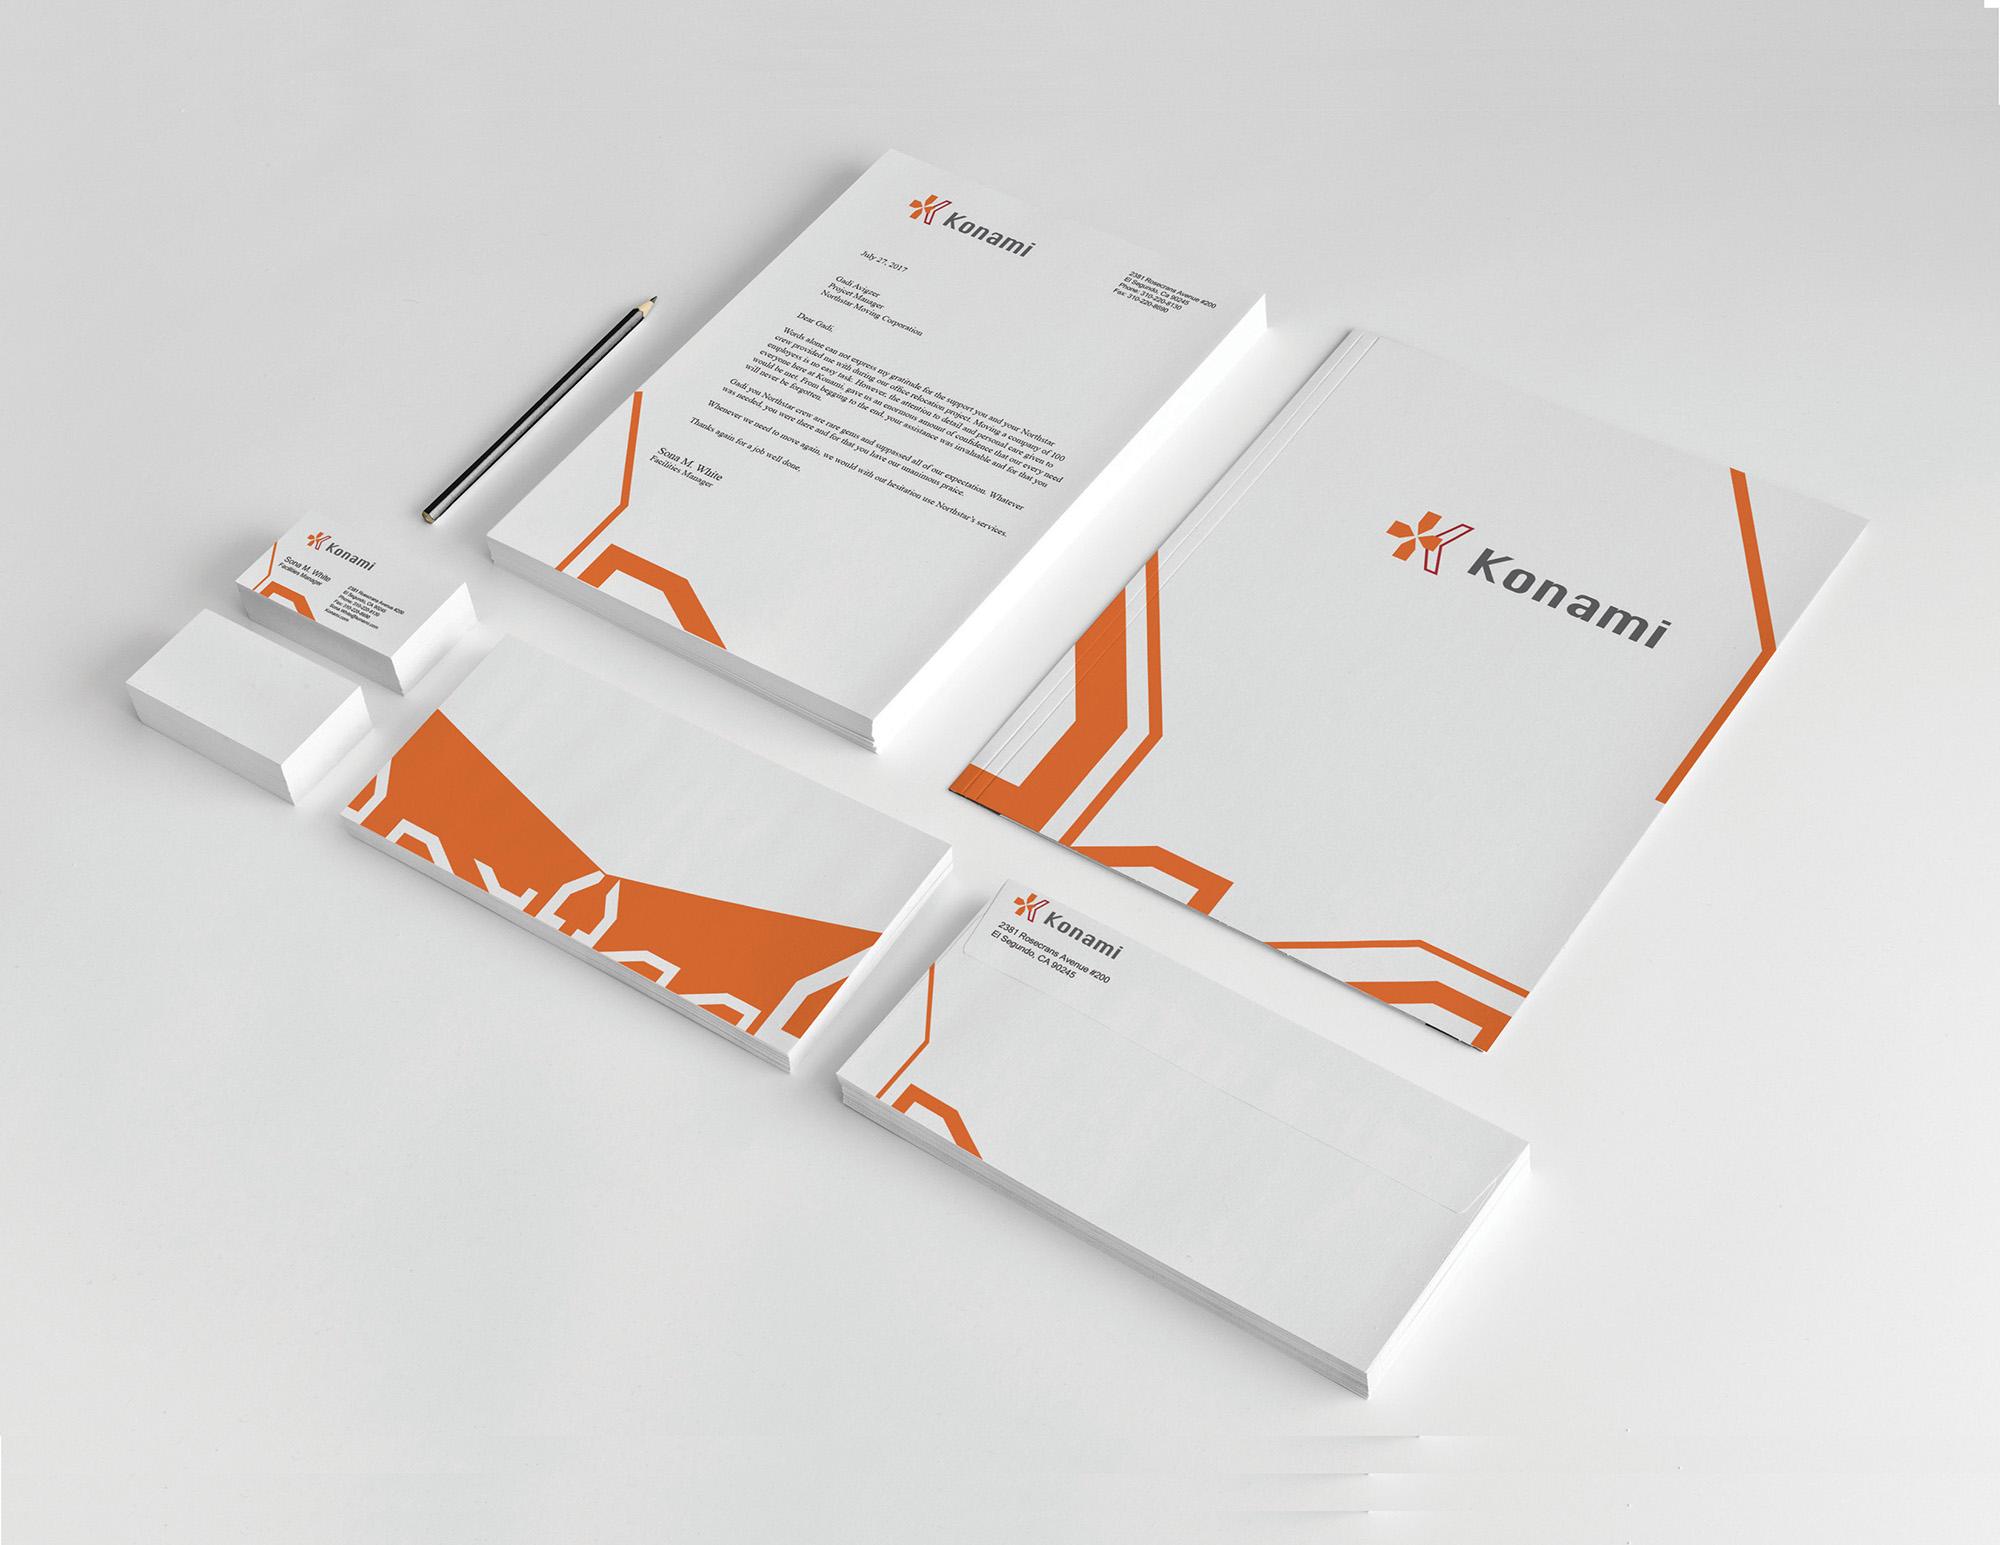 Konami's Brand Identity Guideline Book